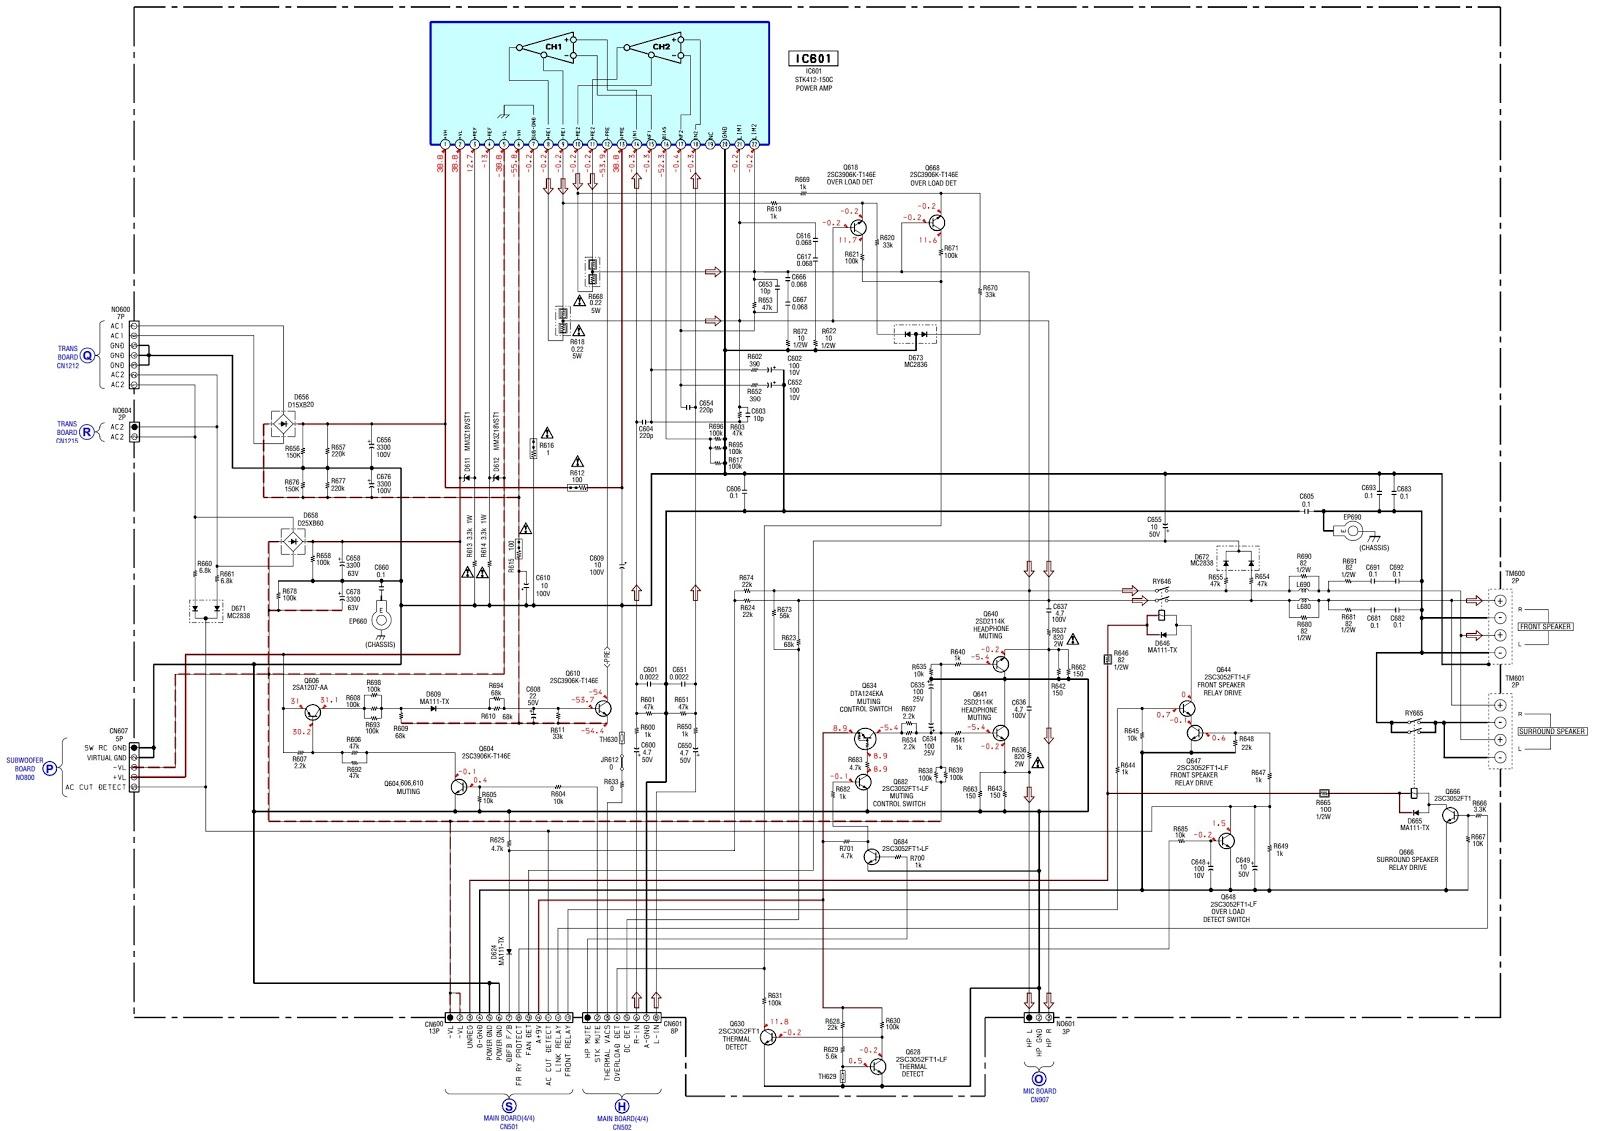 Pretty Tda7265 Amplifier Circuit Diagram Images 2 1 Index 190 Seekiccom Woofer 100 Subwoofer Schematic 2800w High P